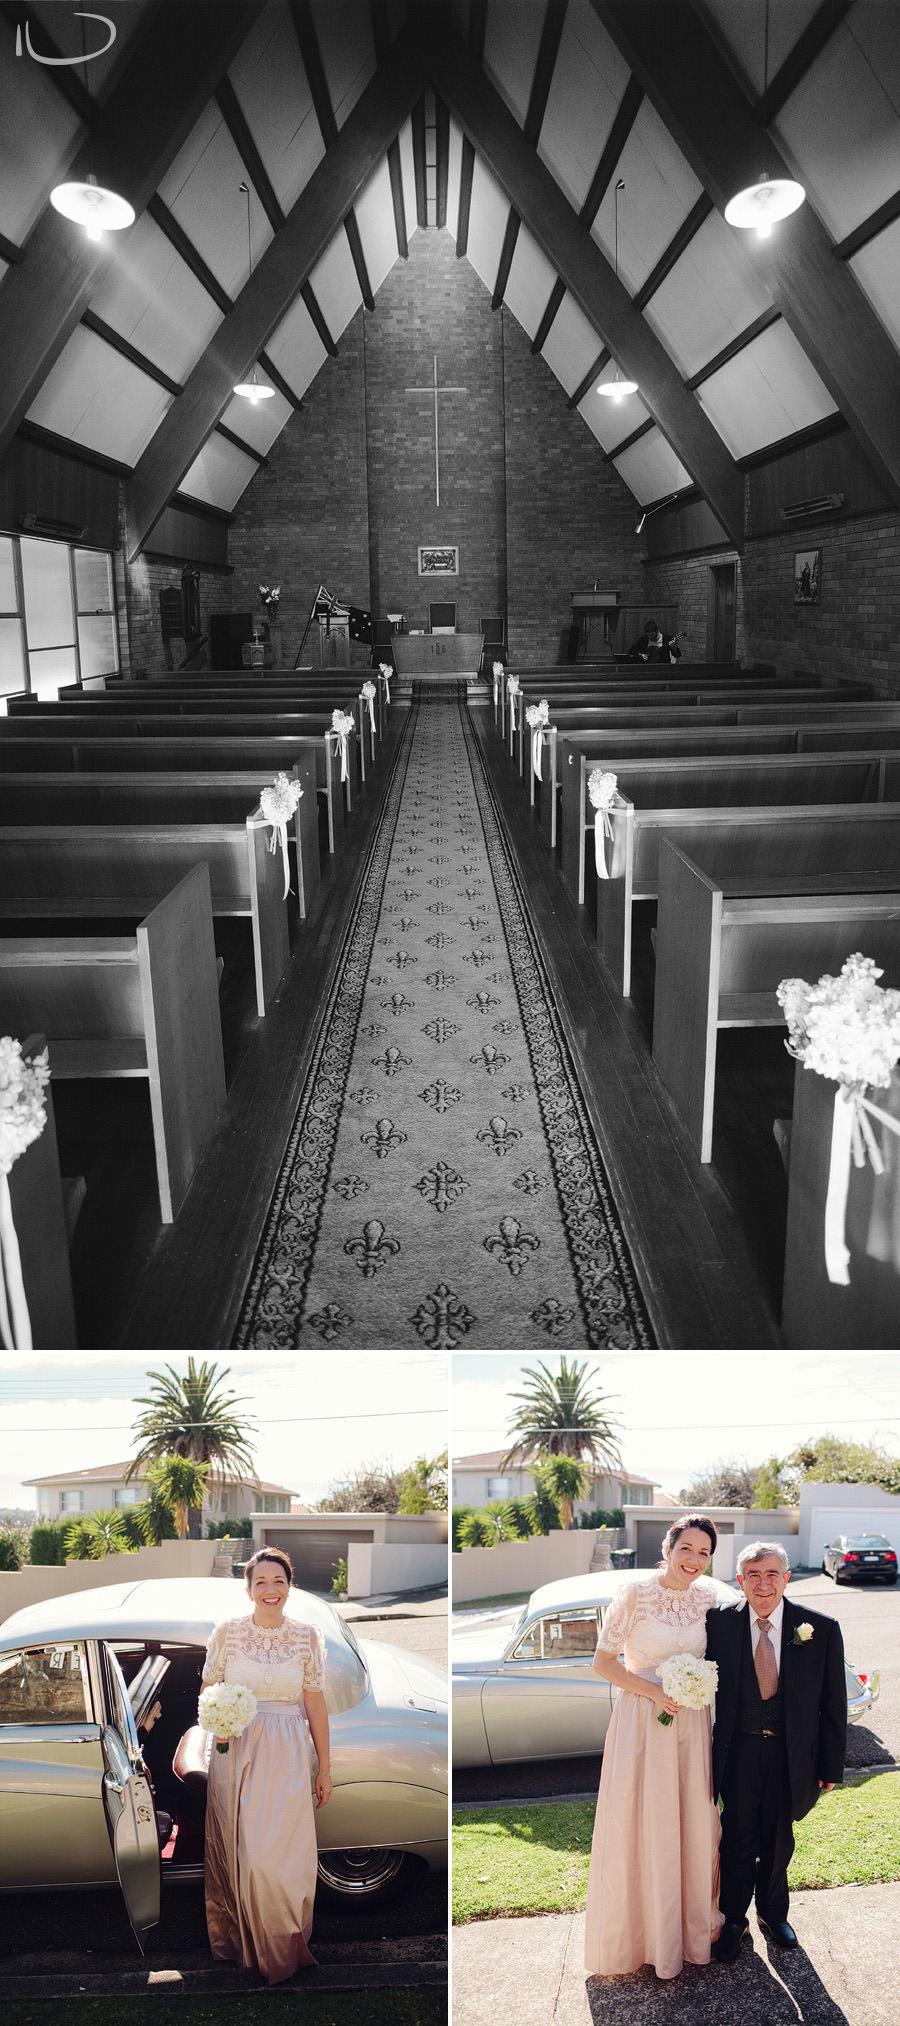 Vaucluse Wedding Photography: Uniting church